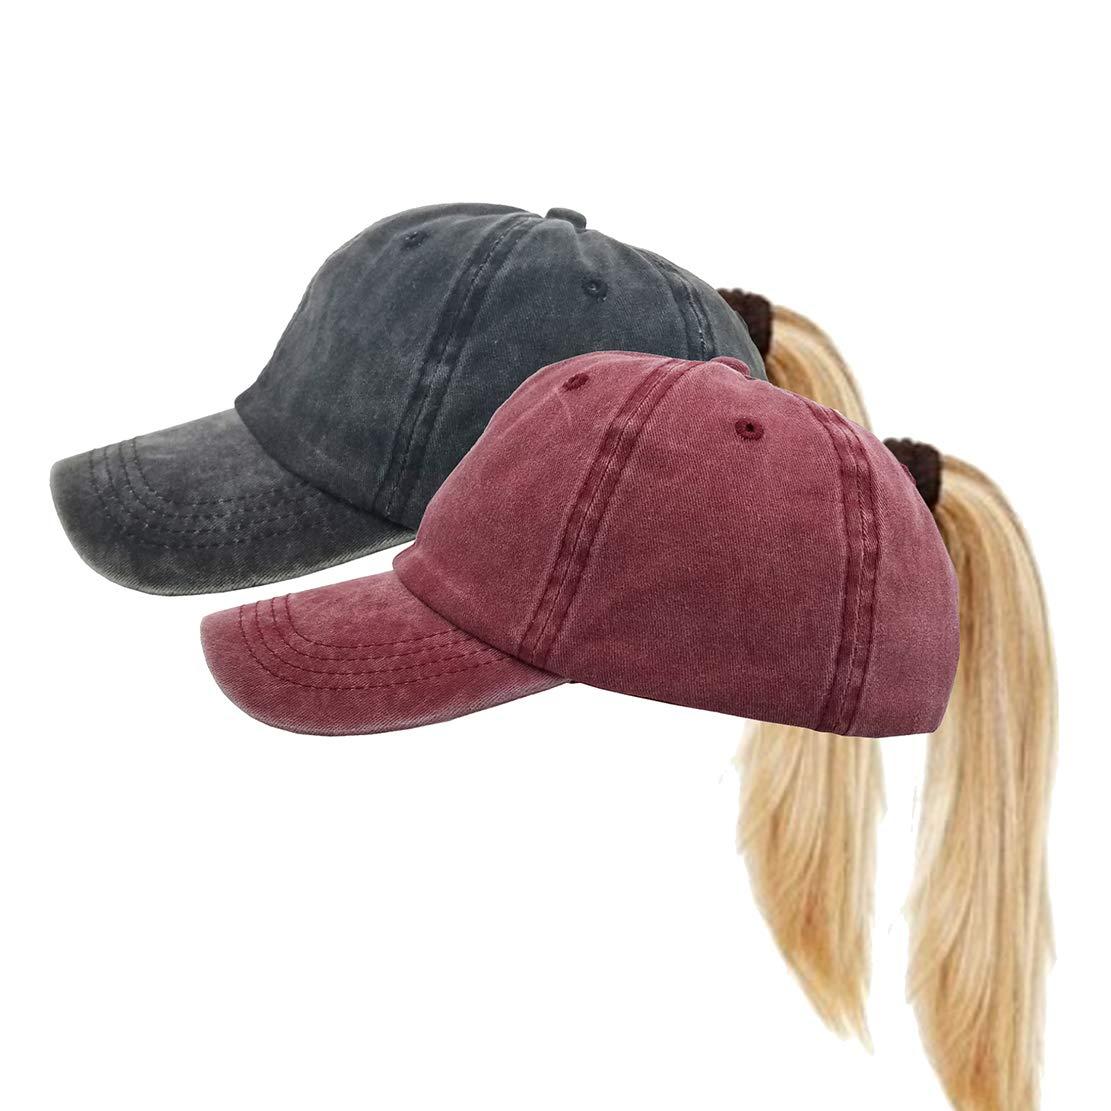 Distressed Ponytail Hats Pony Ball Caps Baseball for Women (Black+Burgundy) by Eohak